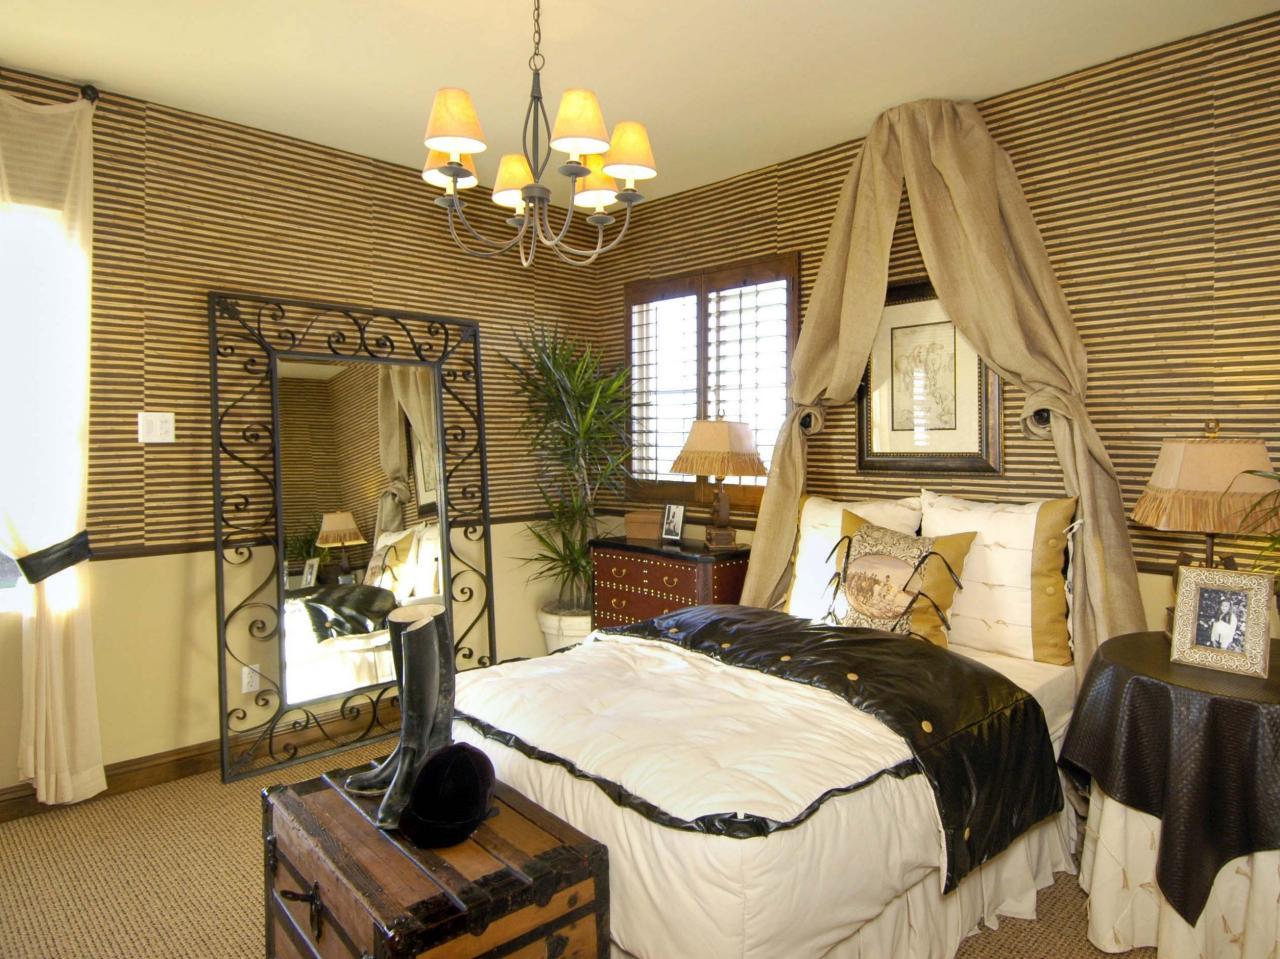 Photos hgtv for Bamboo decorations home decor